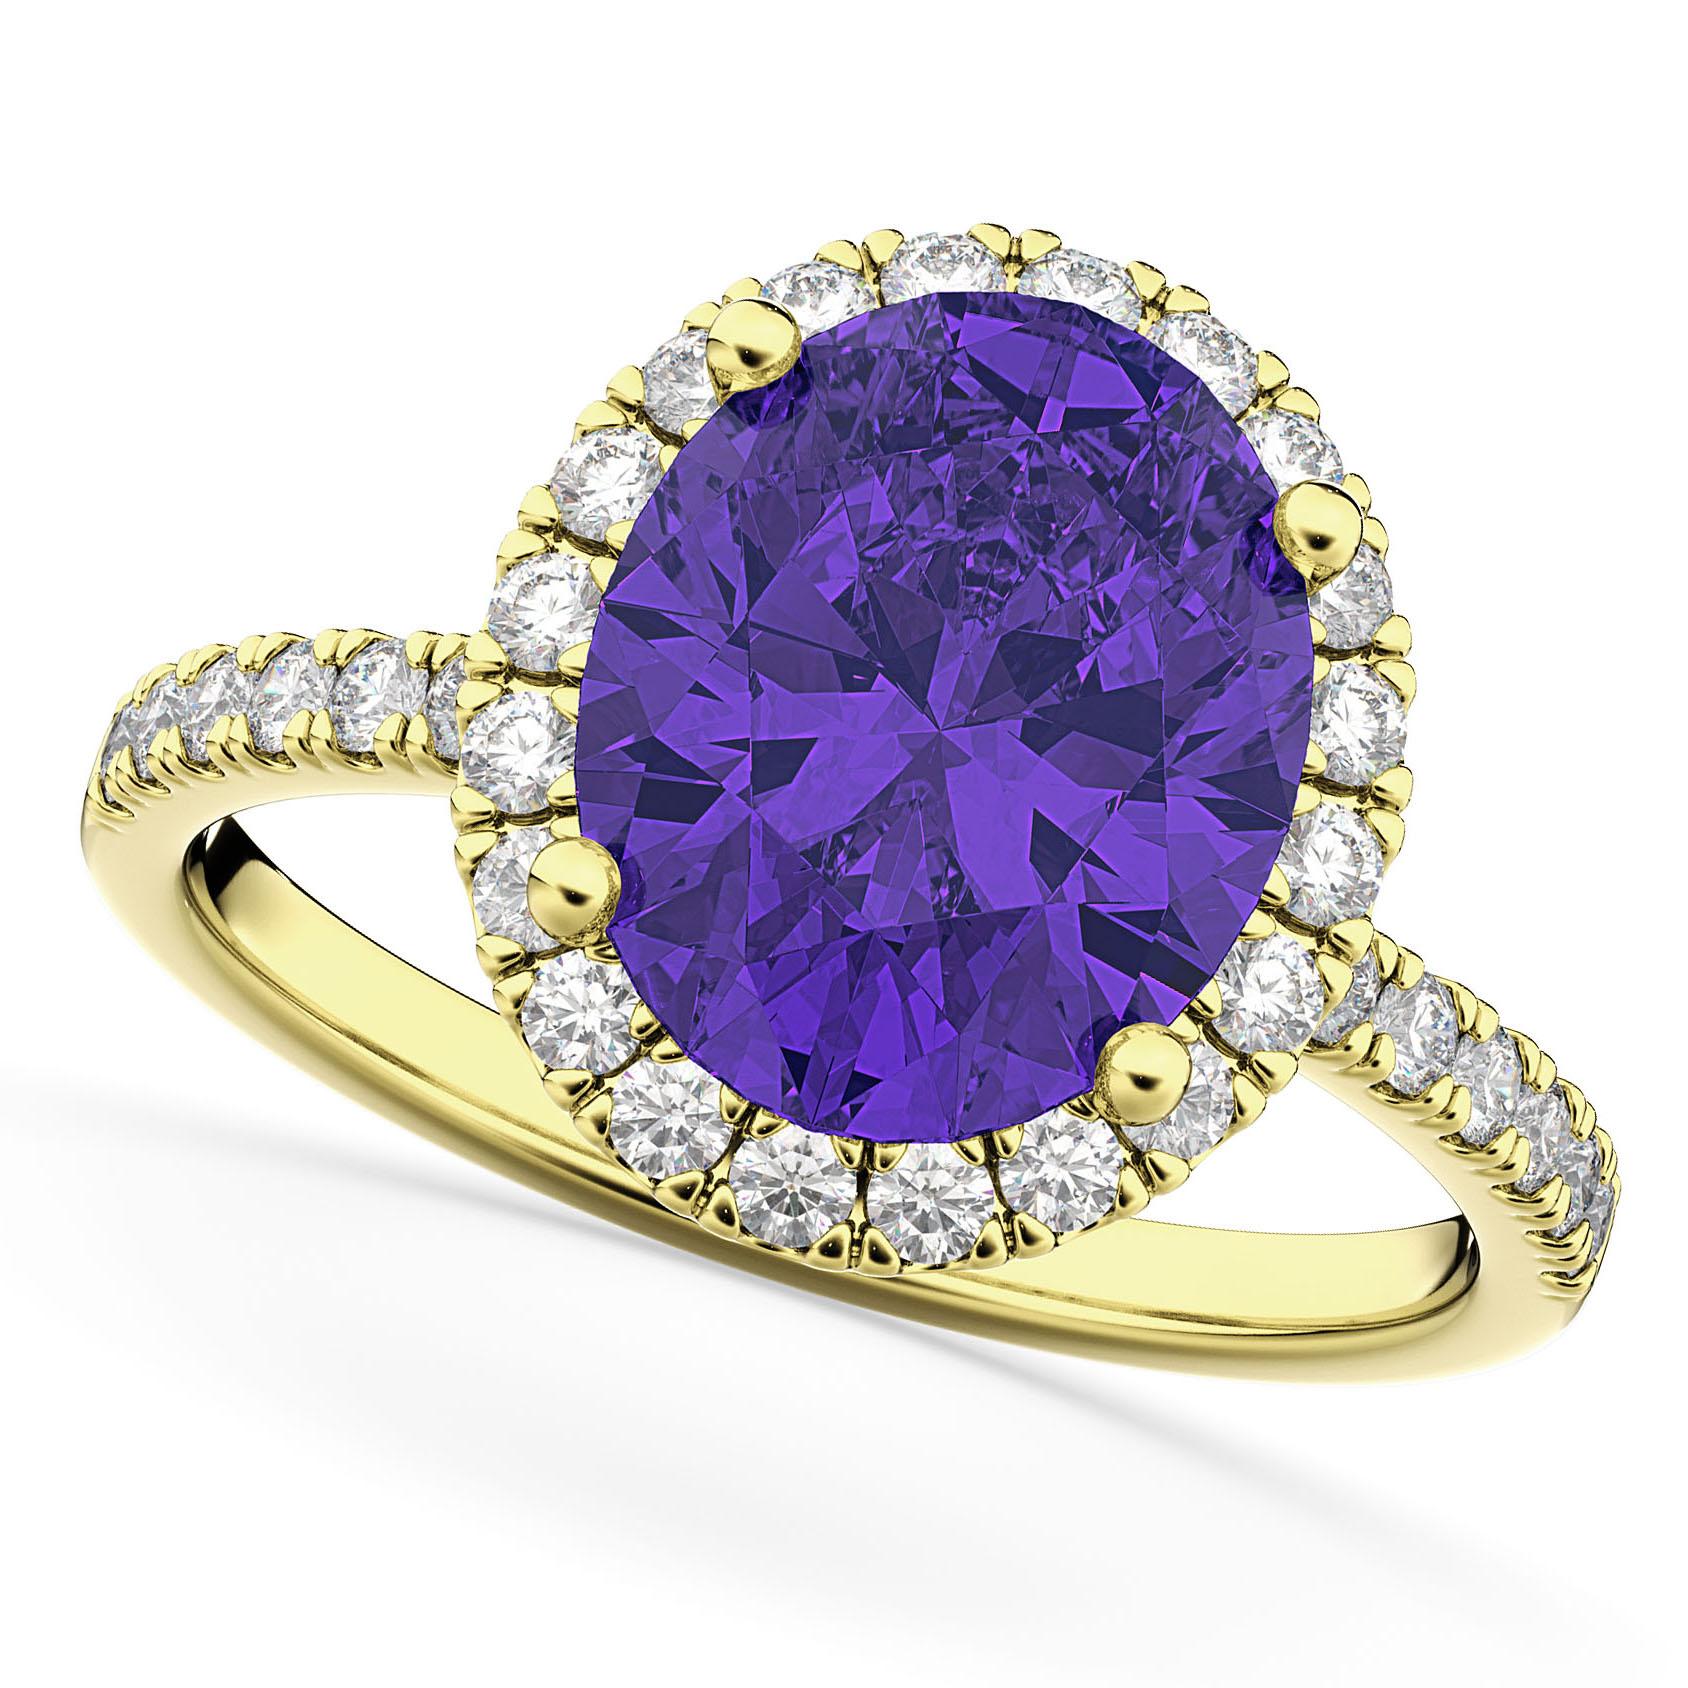 Oval Cut Halo Tanzanite & Diamond Engagement Ring 14K Yellow Gold 3.66ct